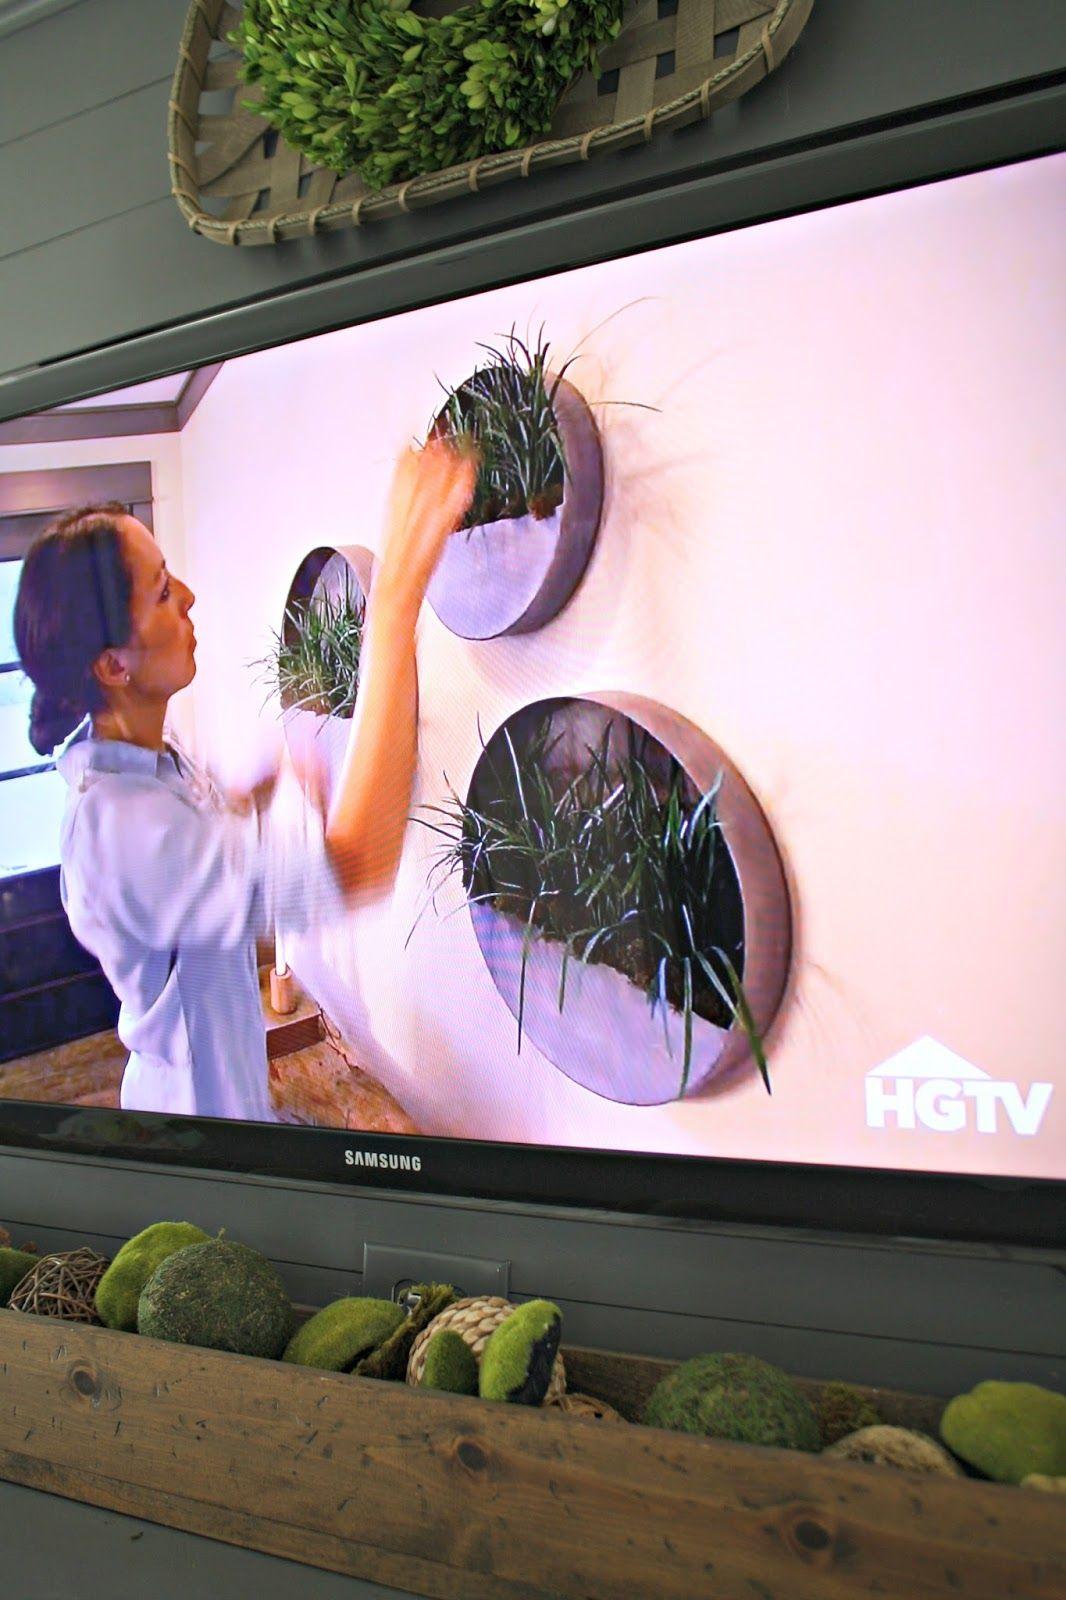 Where To Buy Magnolia Homes Farmhouse Style For Way Less Magnolia Homes Cheap Farmhouse Decor Farmhouse Wall Art Diy